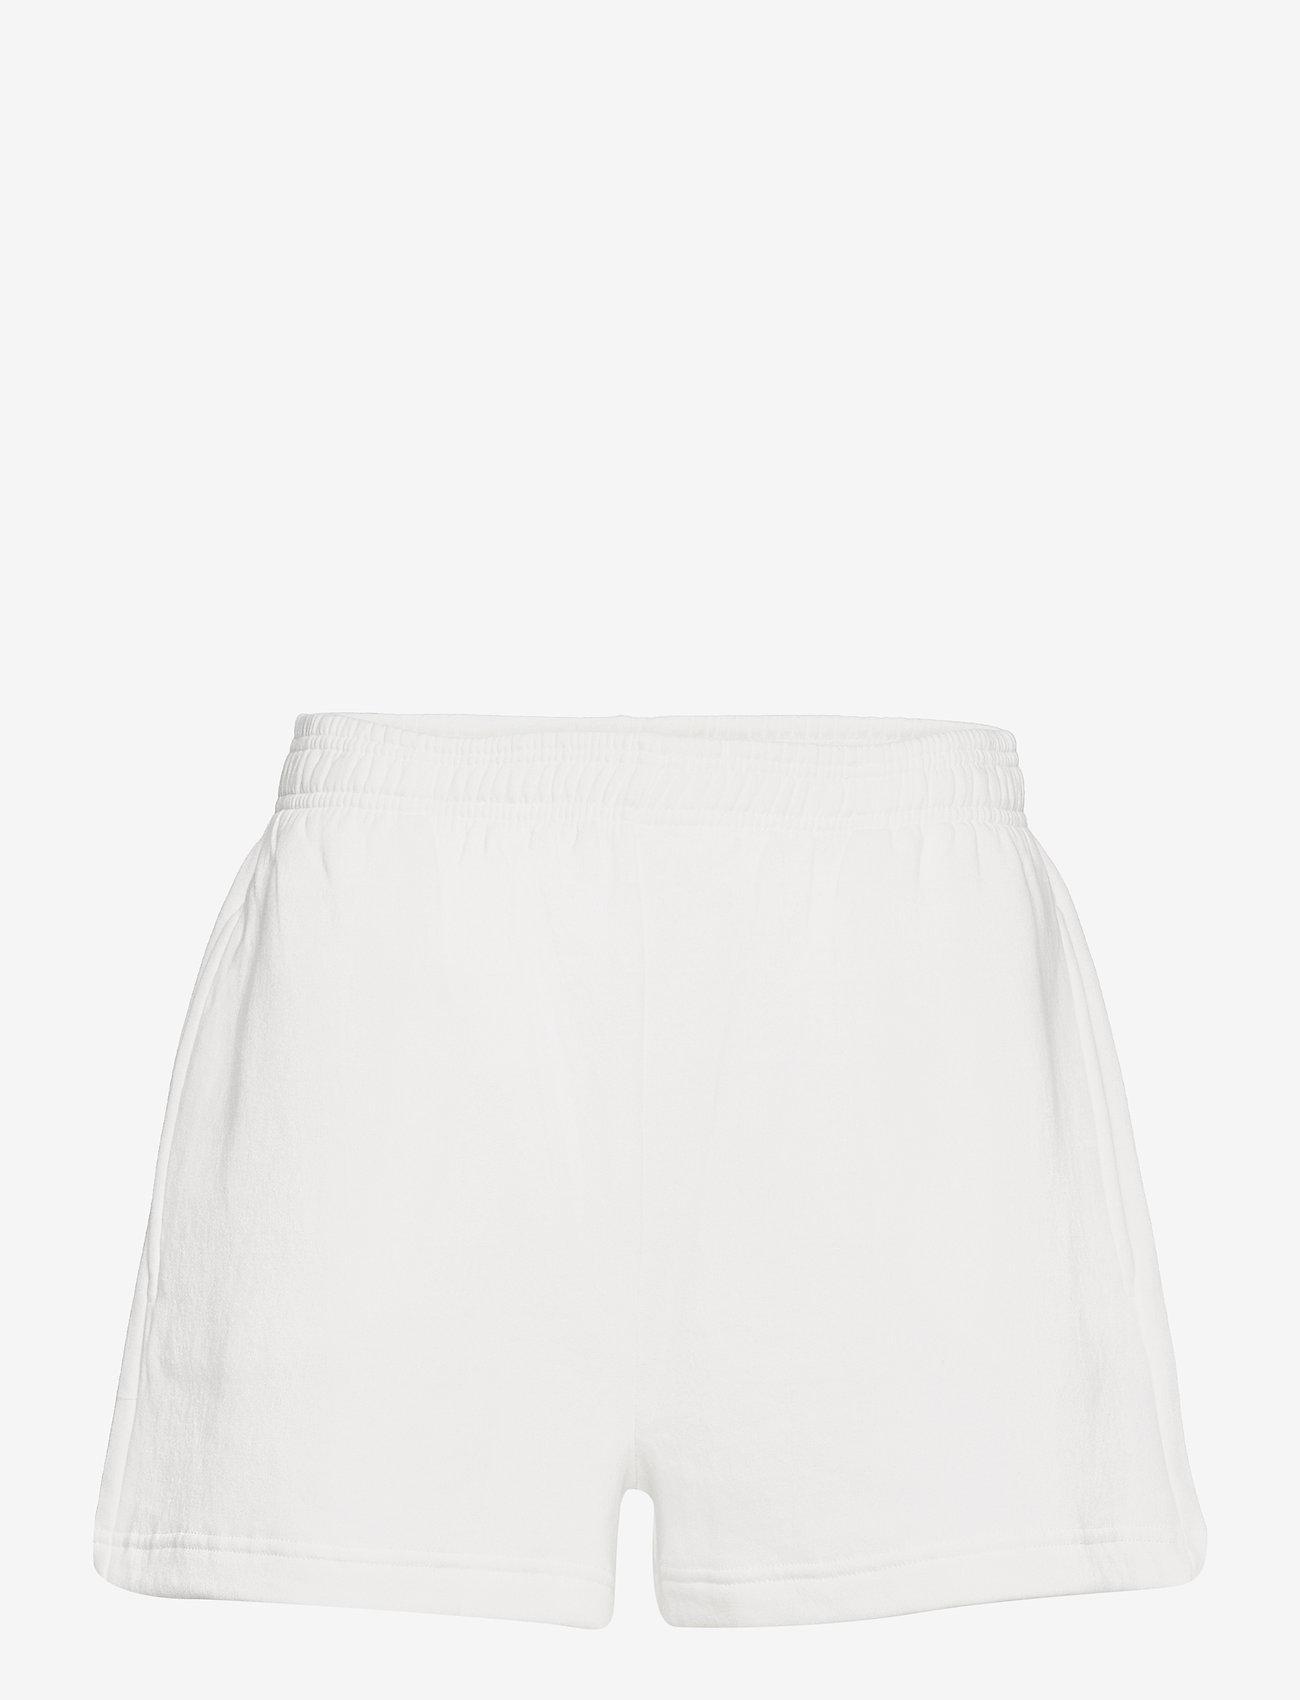 Gina Tricot - Gia shorts - shorts casual - offwhite - 0